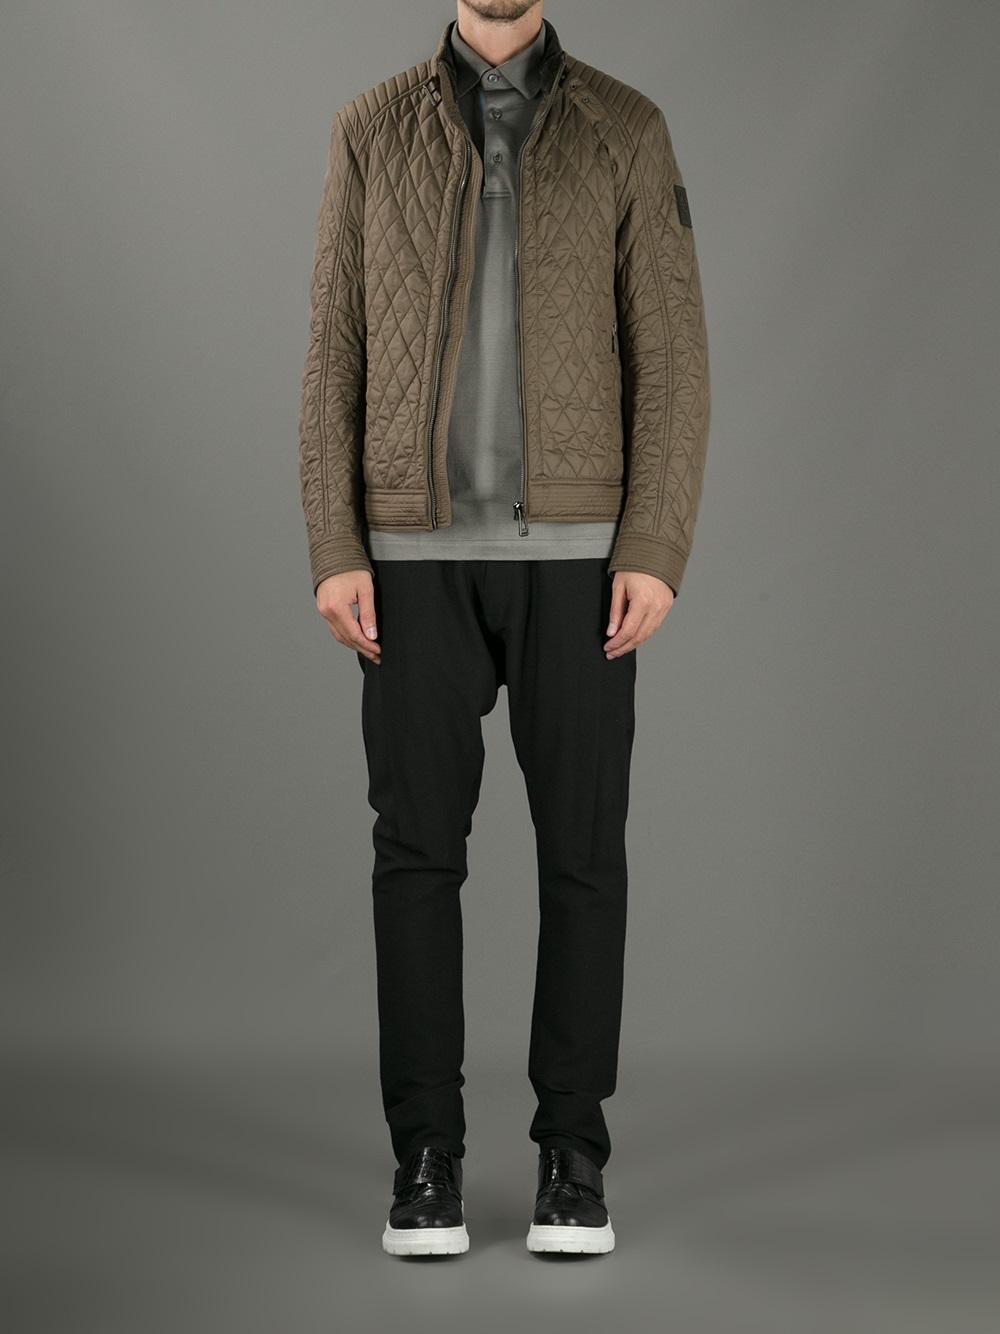 Lyst Belstaff Bramley Quilted Jacket In Brown For Men